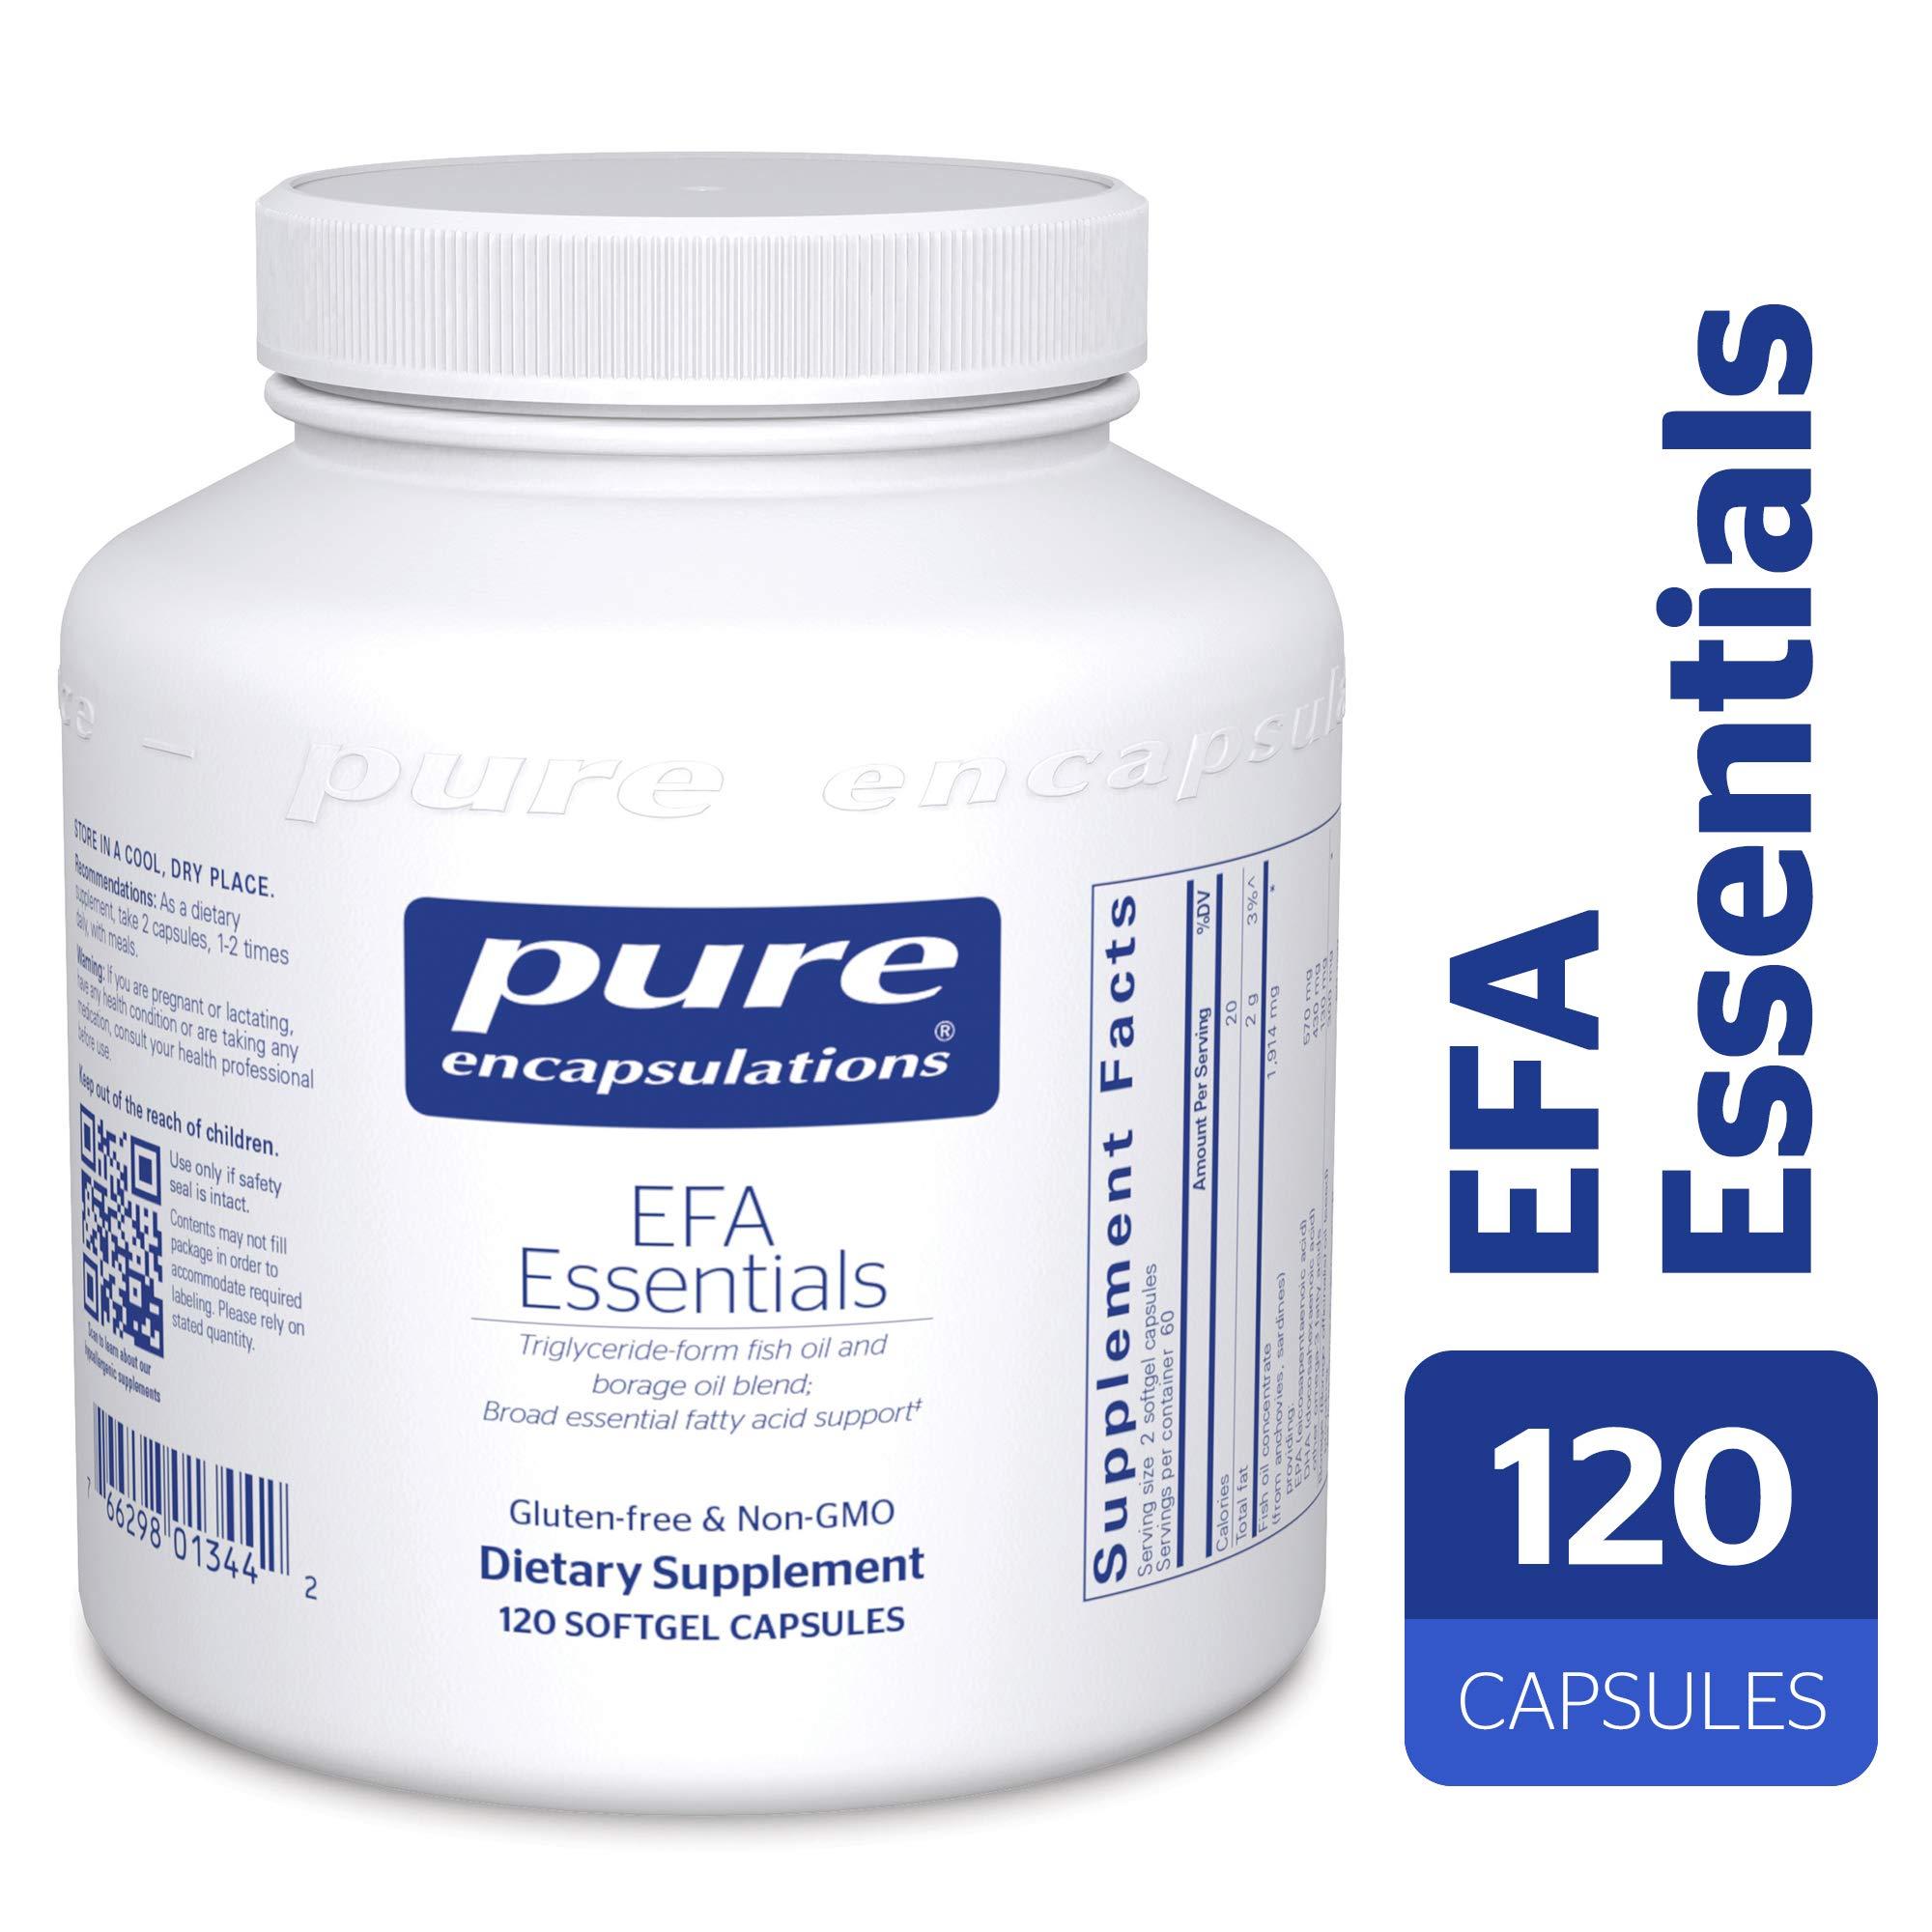 Pure Encapsulations - EFA Essentials - Triglyceride-Form Fish Oil and Borage Oil Blend - 120 Softgel Capsules